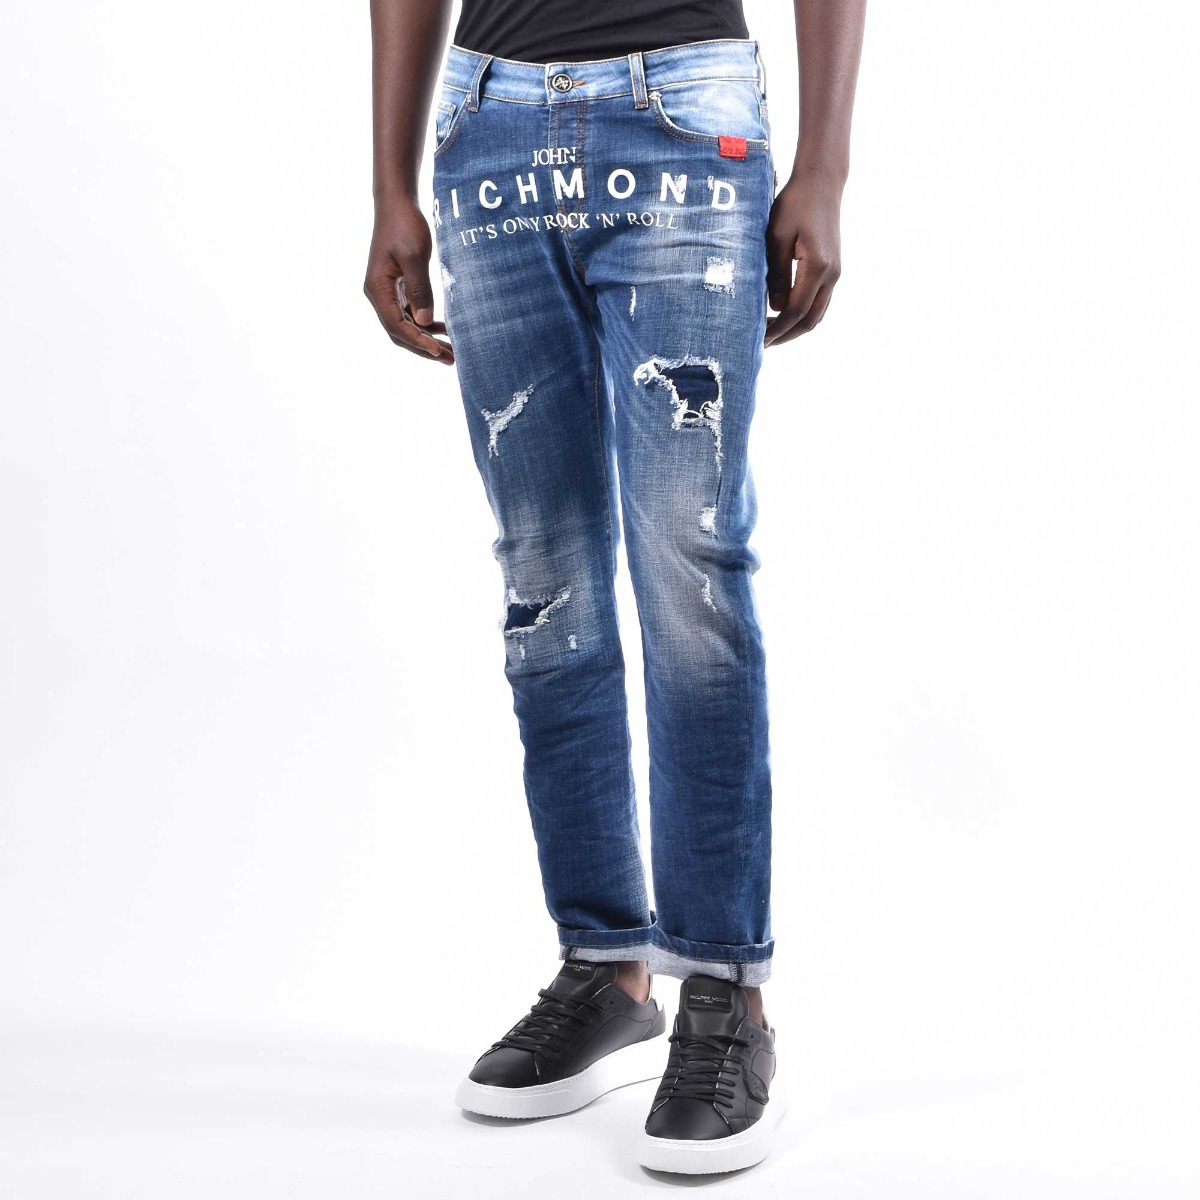 Jeans galat bicolor - Denim medio